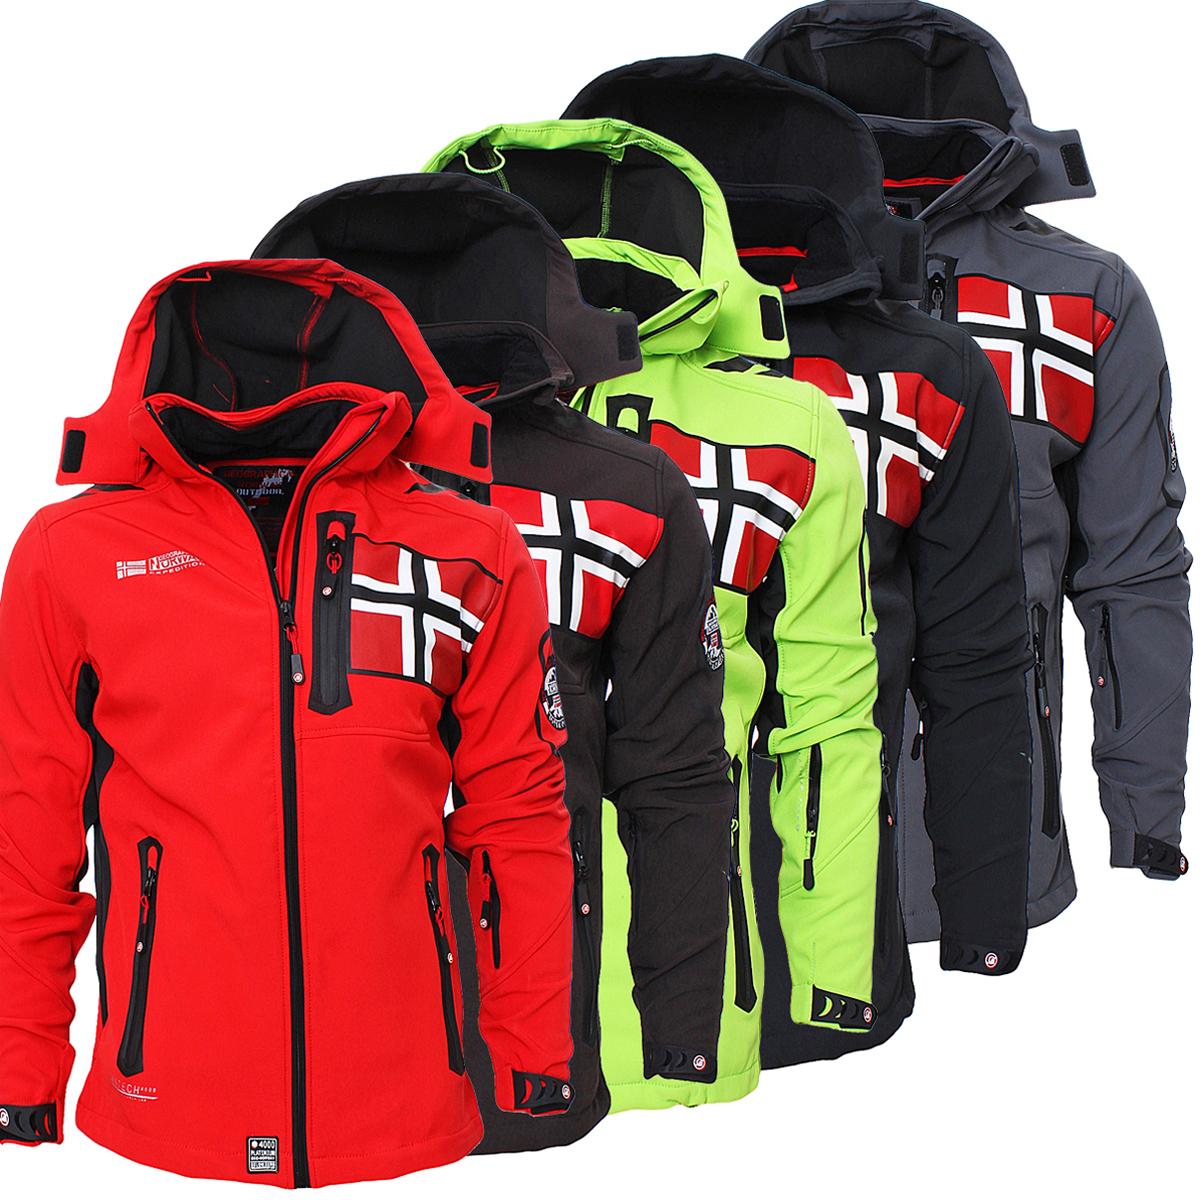 Details zu Geographical Norway Rova Men Herren Softshell Jacke Winterjacke S XXL